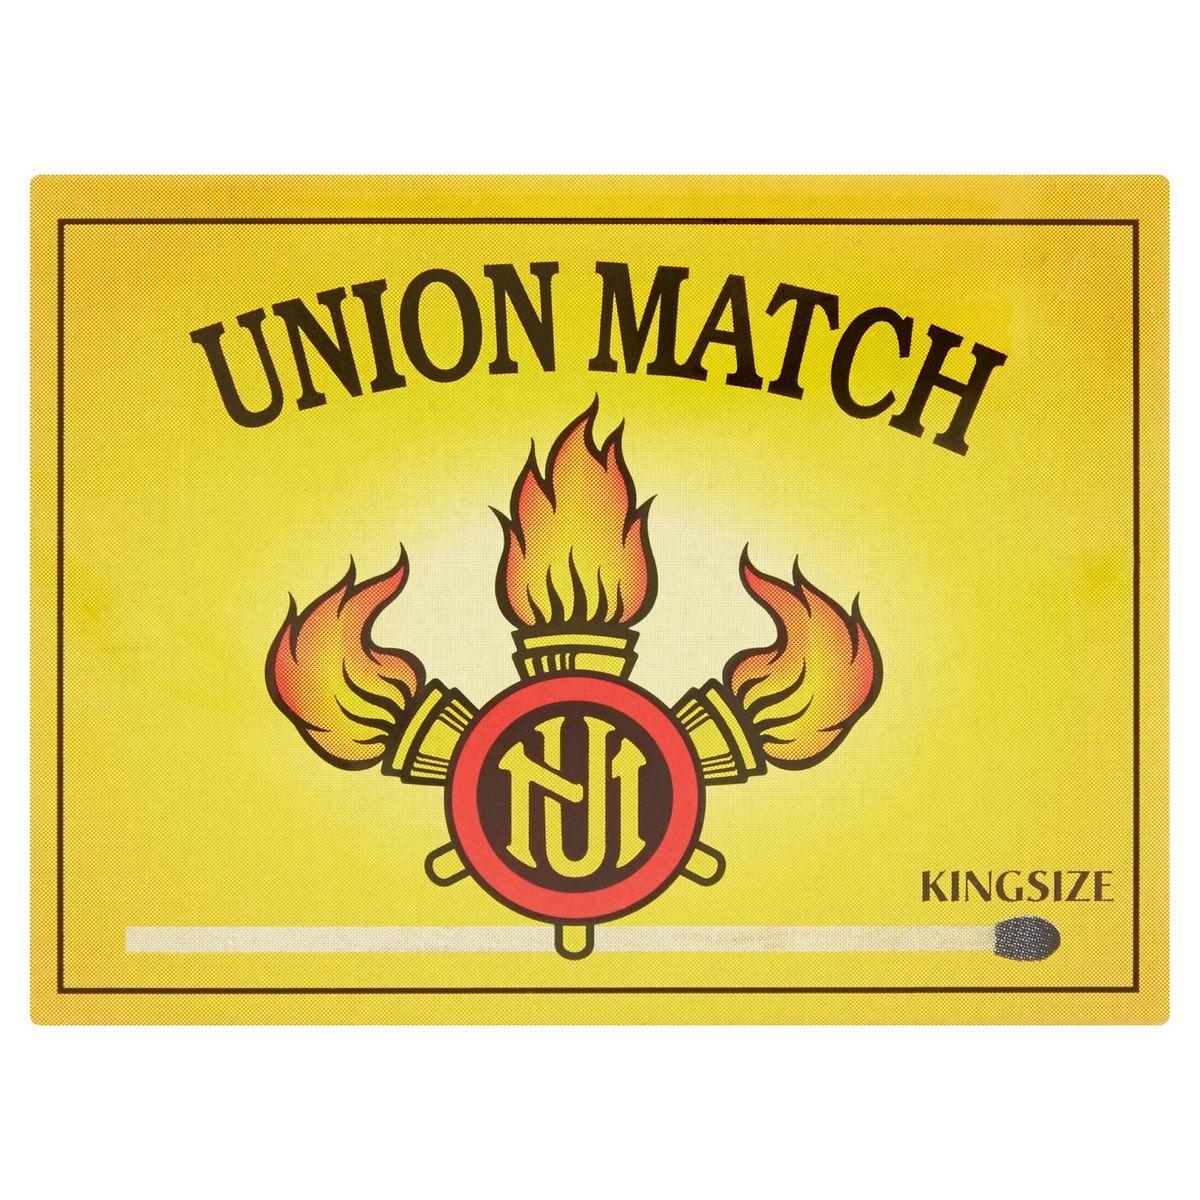 Union Match Kingsize 5-Pak